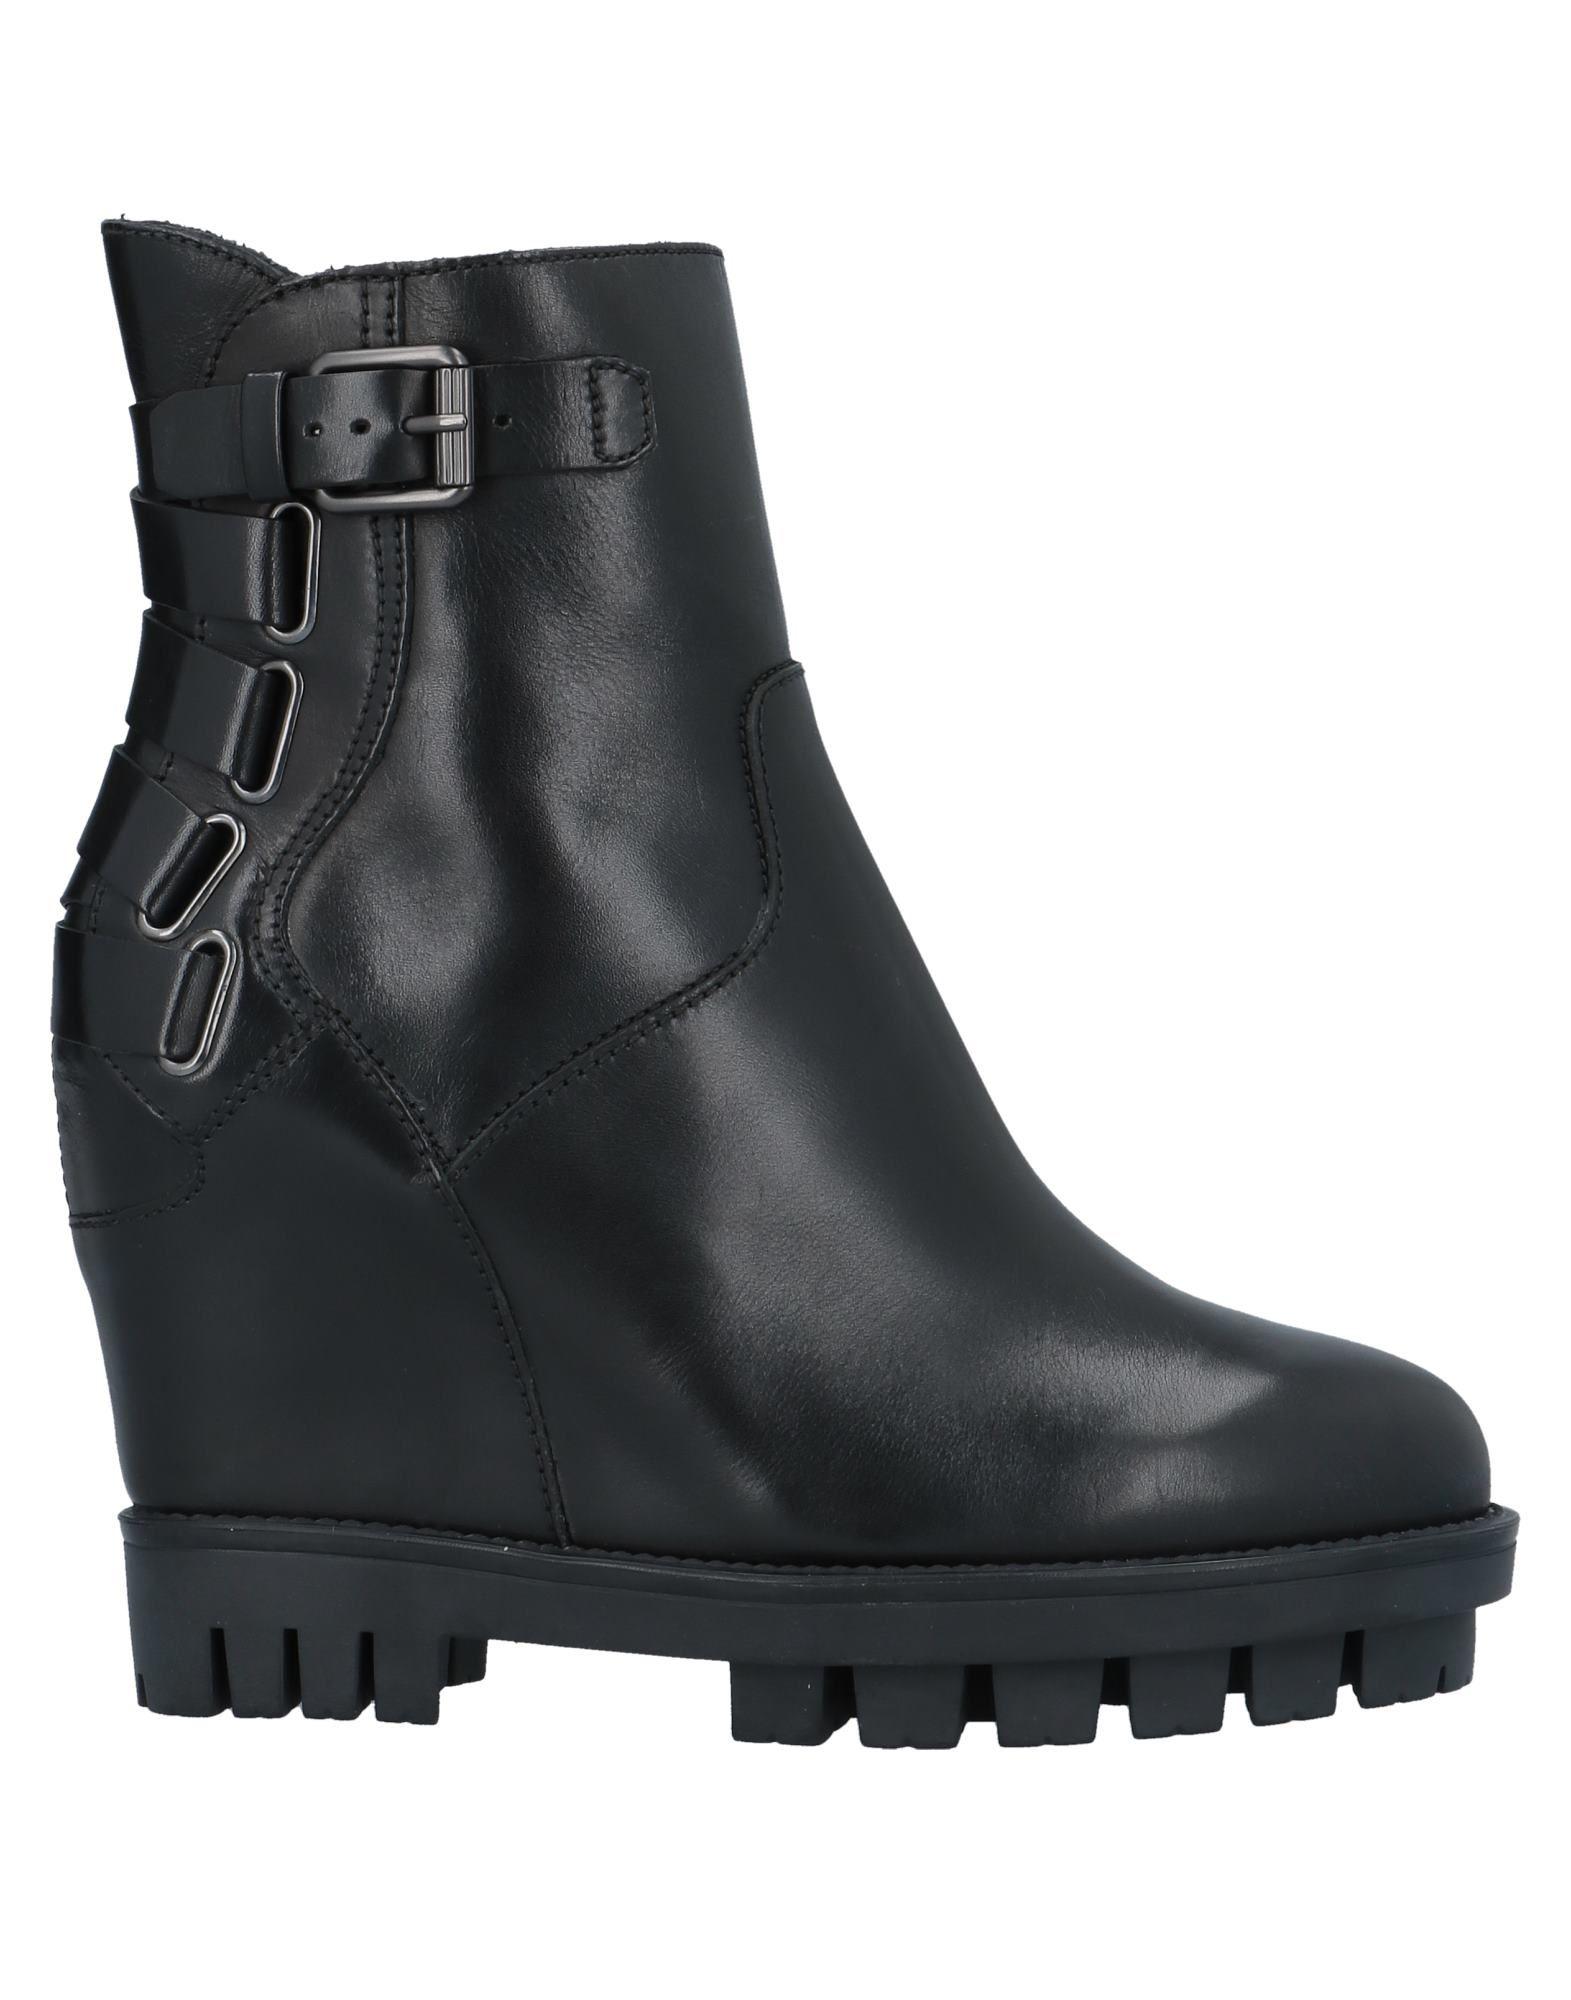 HOGAN REBEL Полусапоги и высокие ботинки hogan rebel полусапоги и высокие ботинки